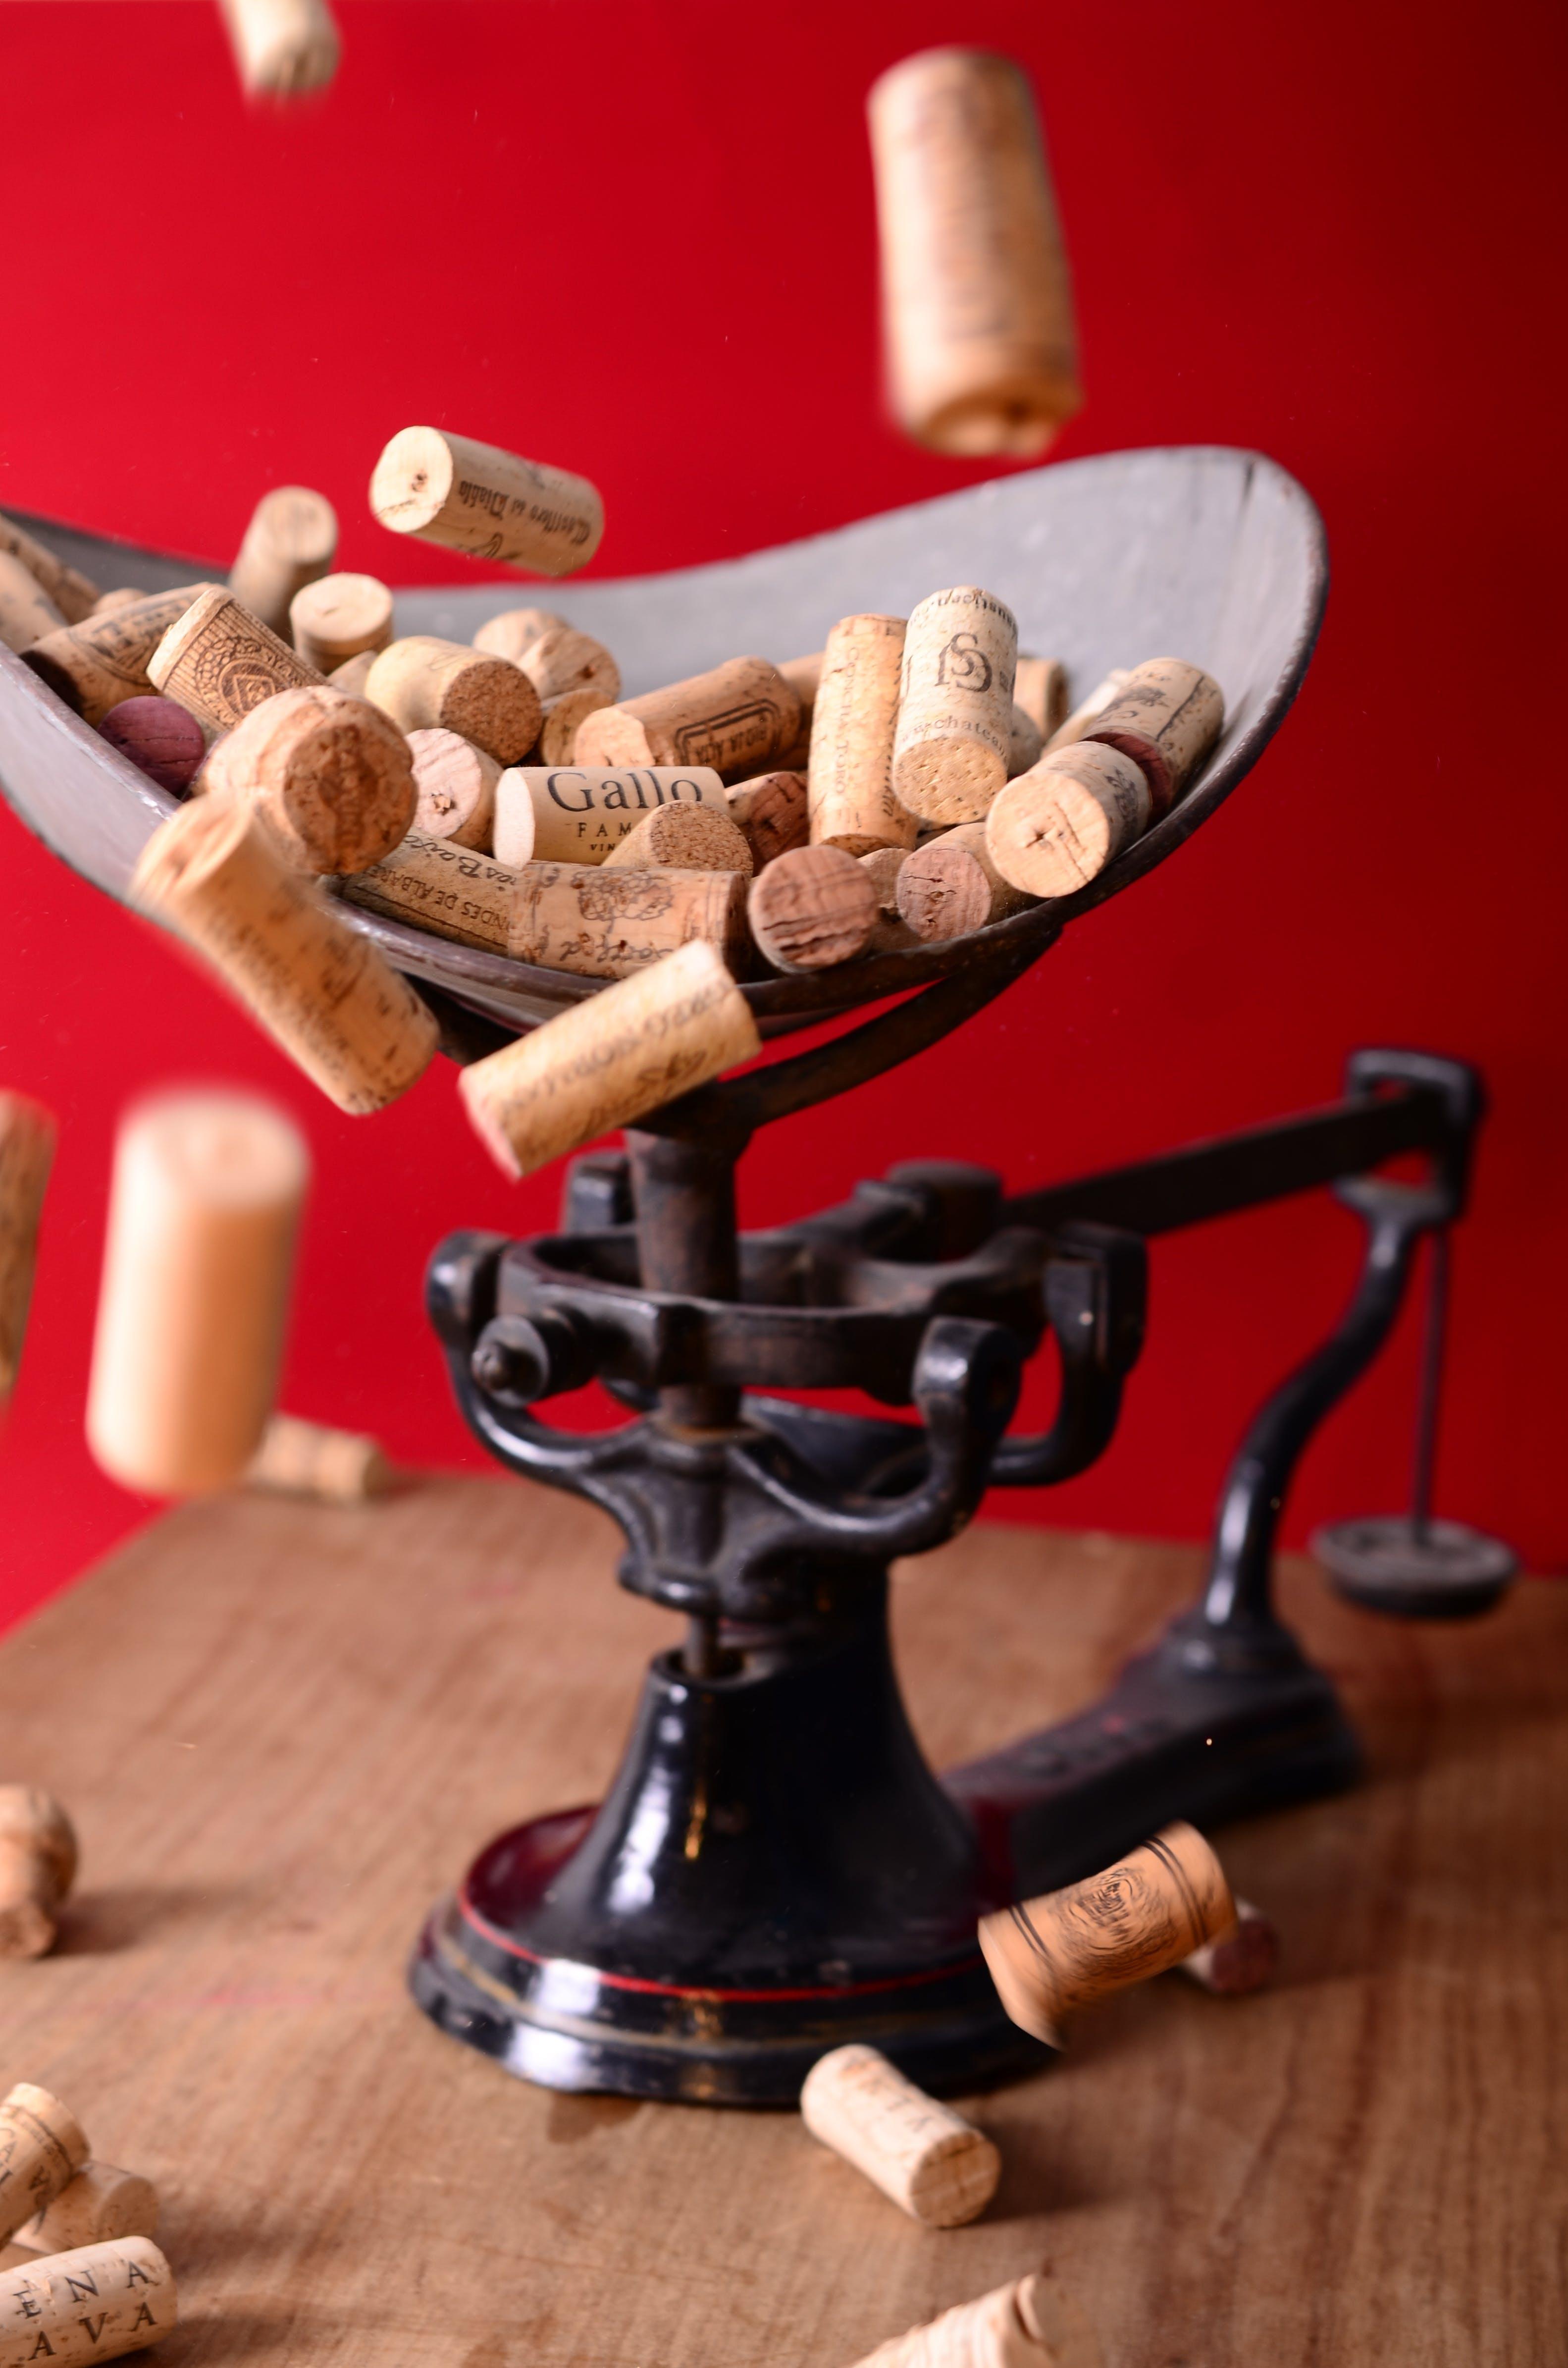 Free stock photo of wine, corks